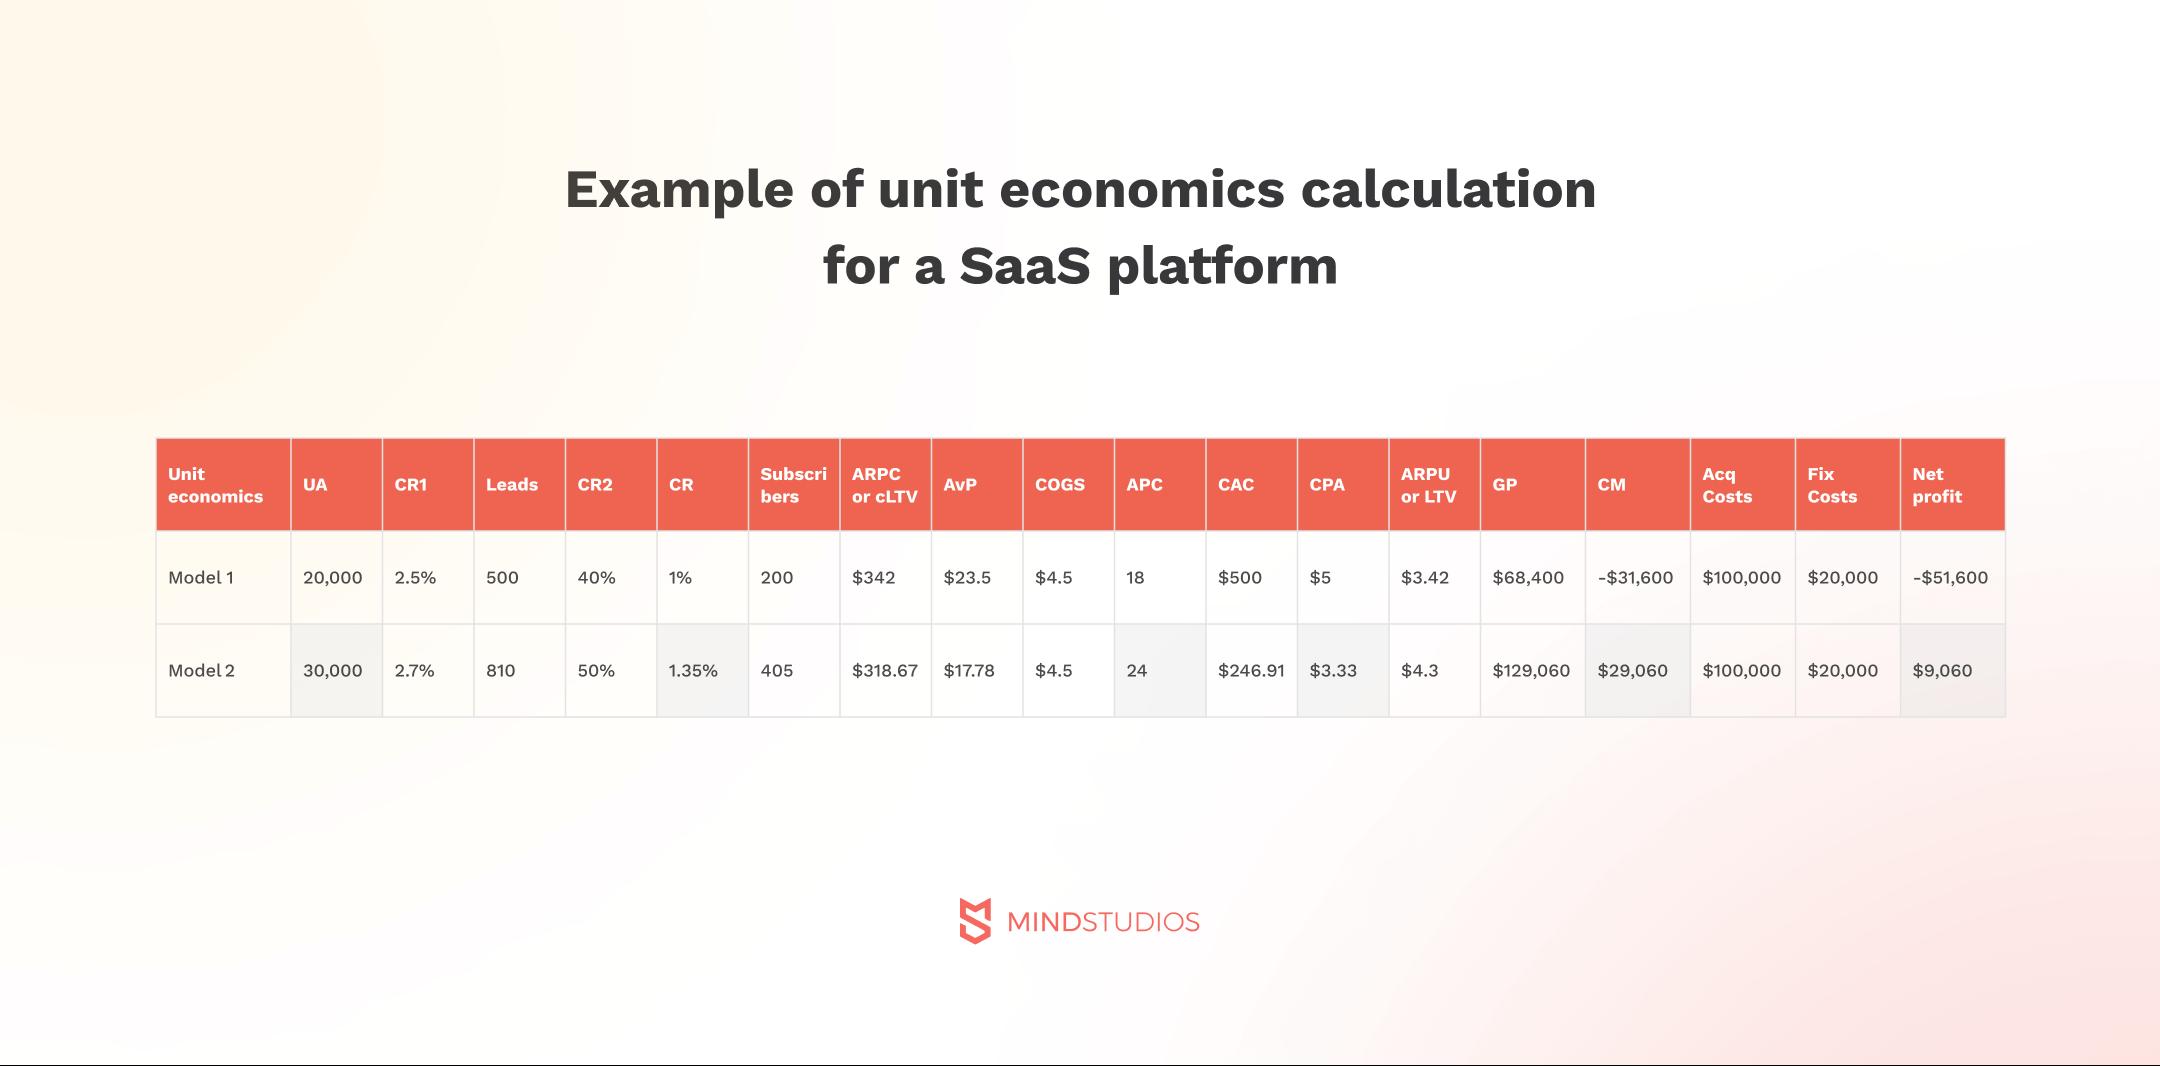 Example of unit economics calculation for SaaS platform